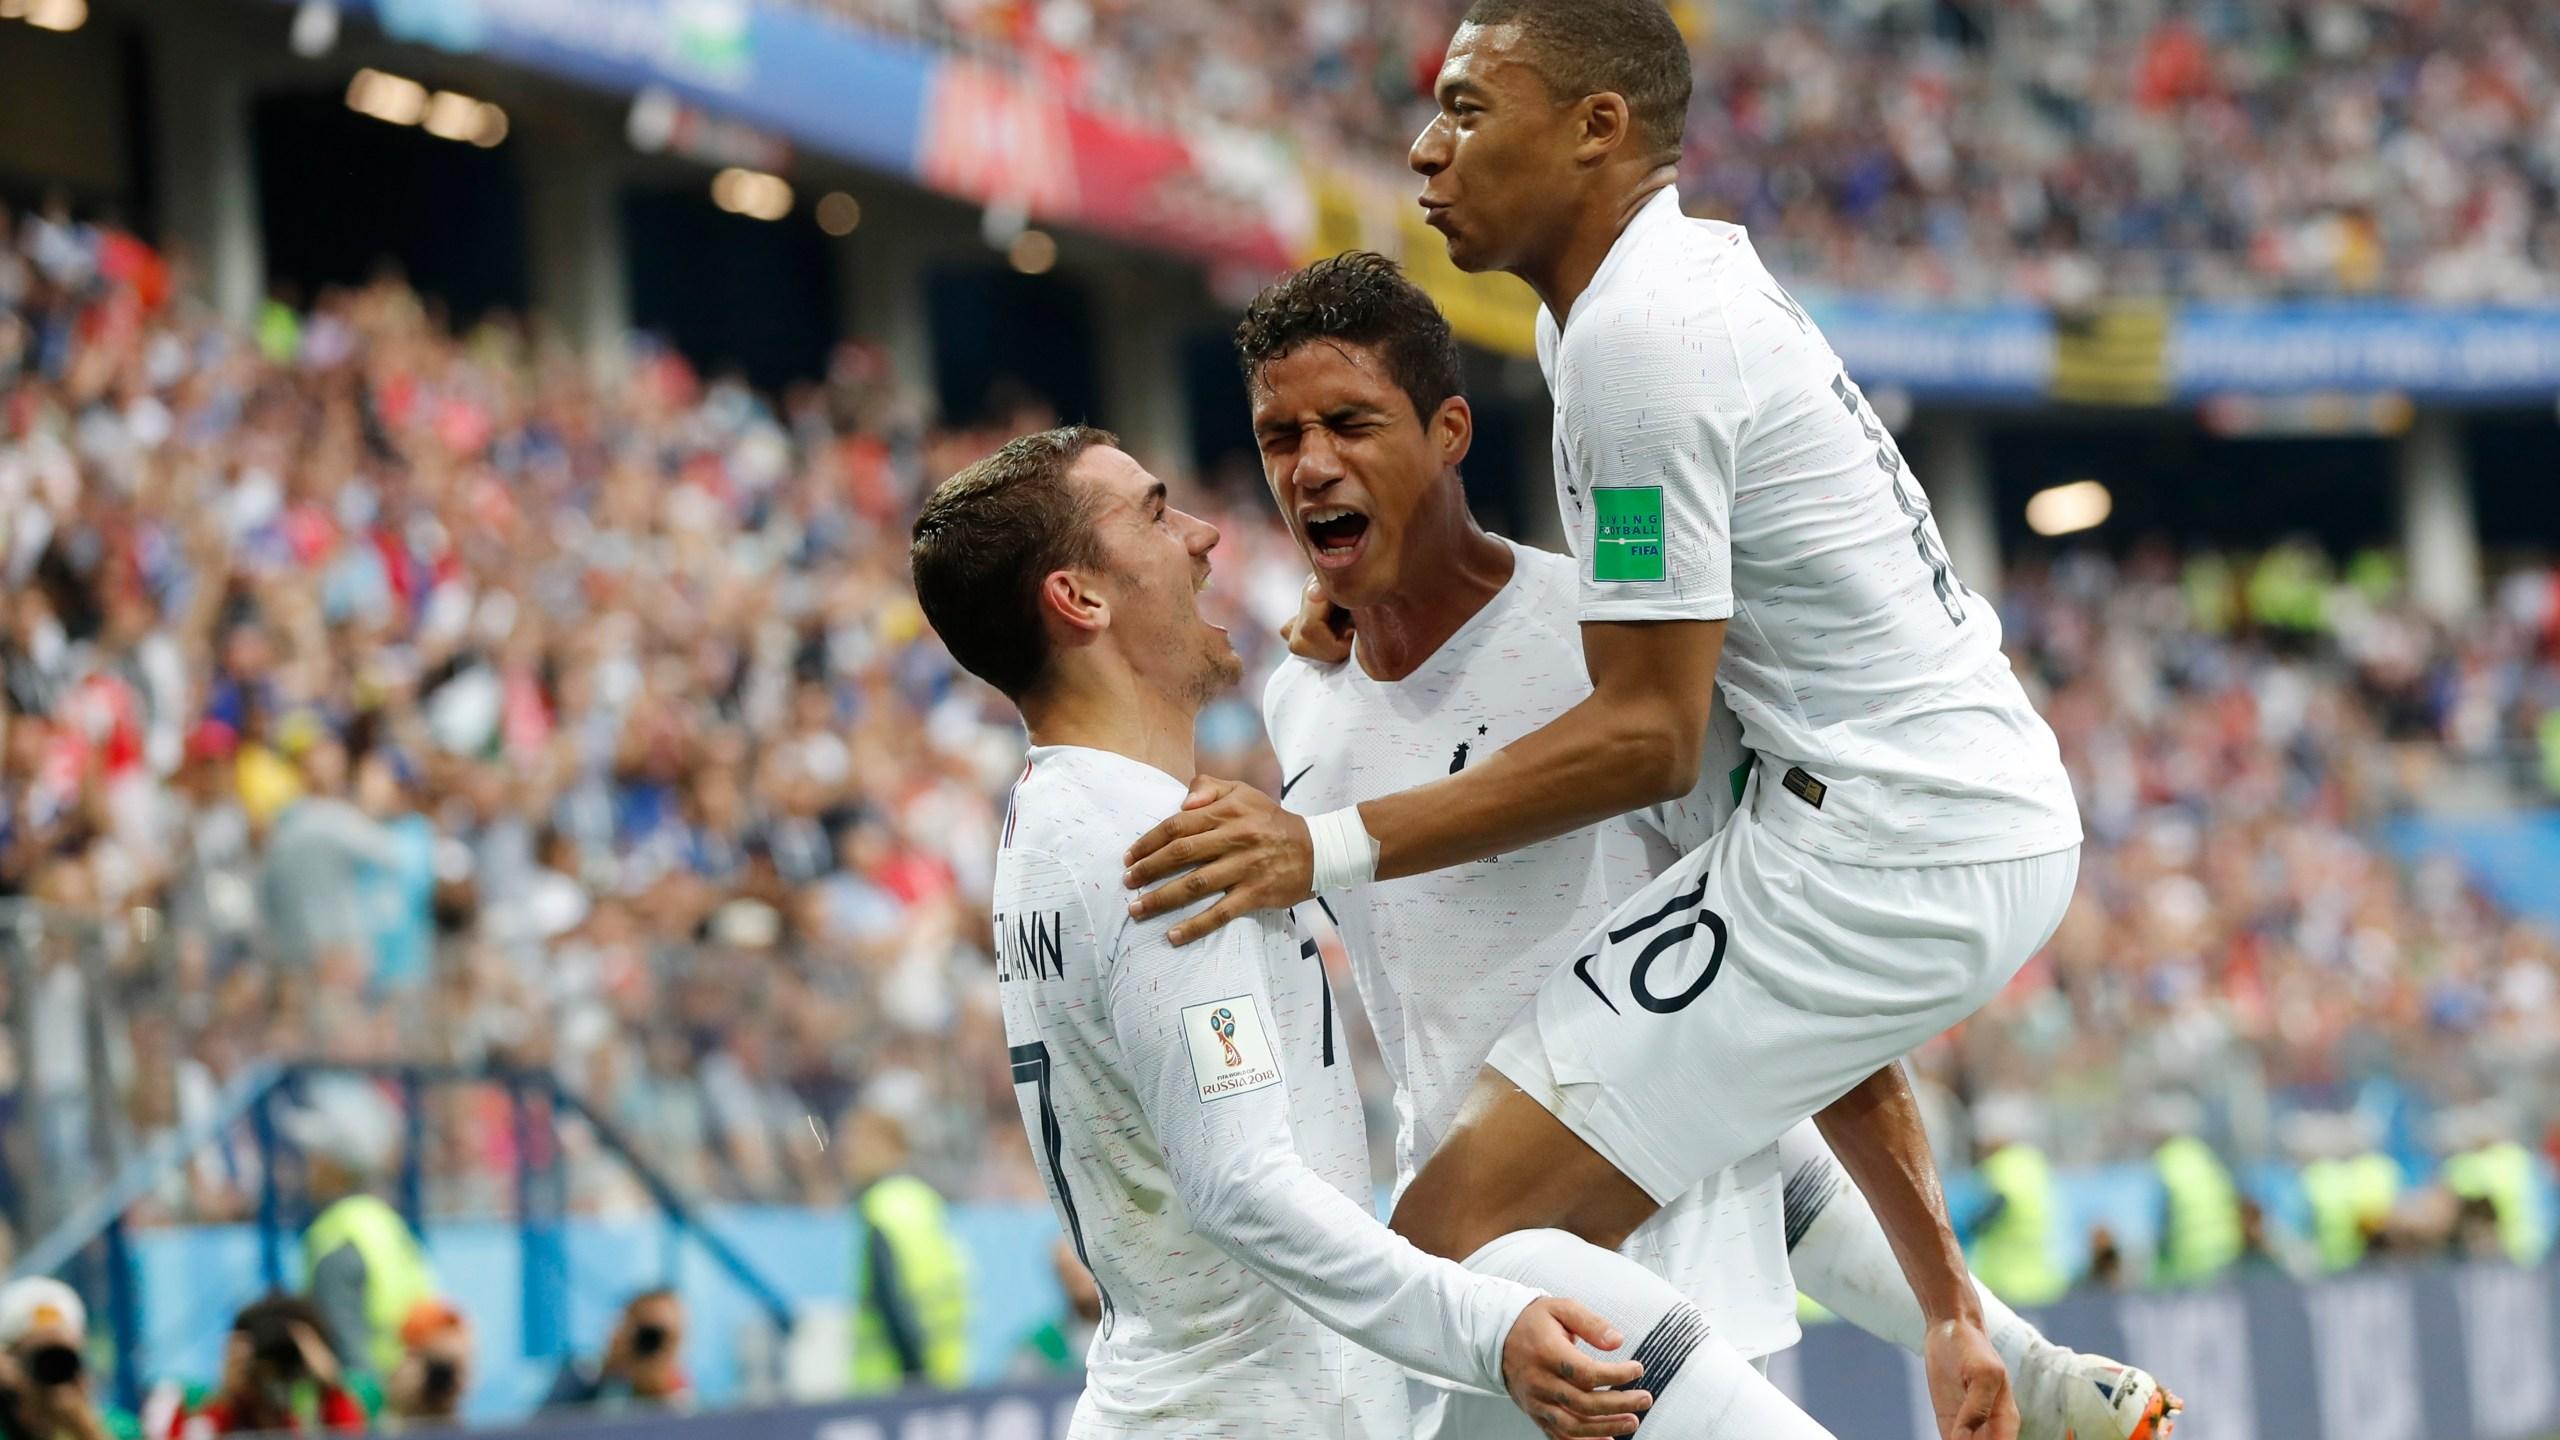 Russia_Soccer_WCup_Uruguay_France_36650-159532.jpg82779319